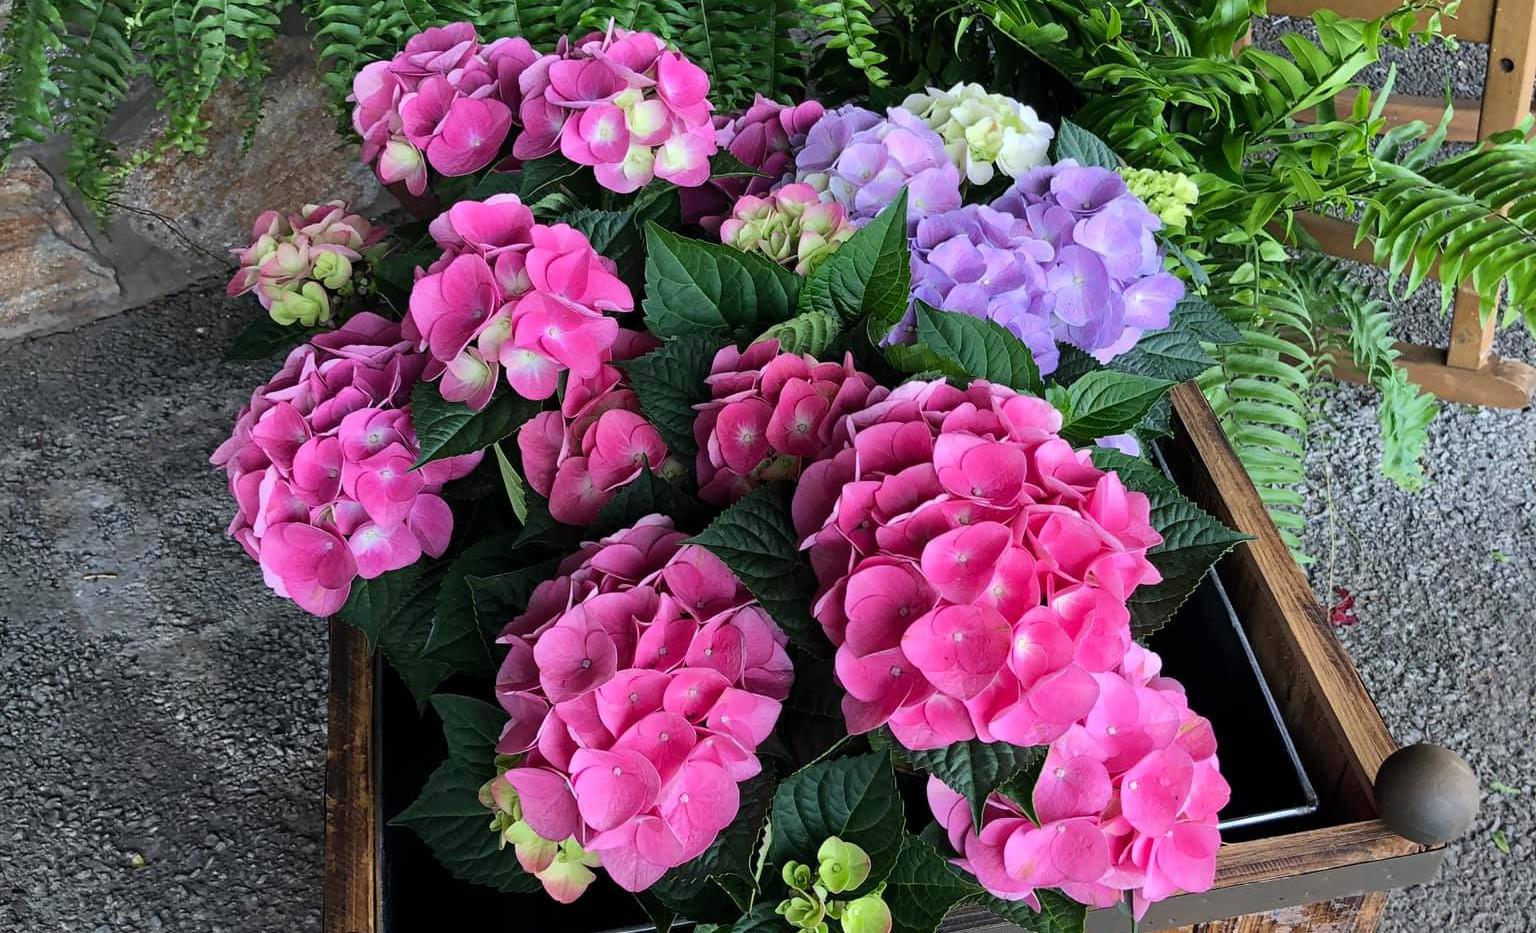 Florist Hydrangeas.jpg